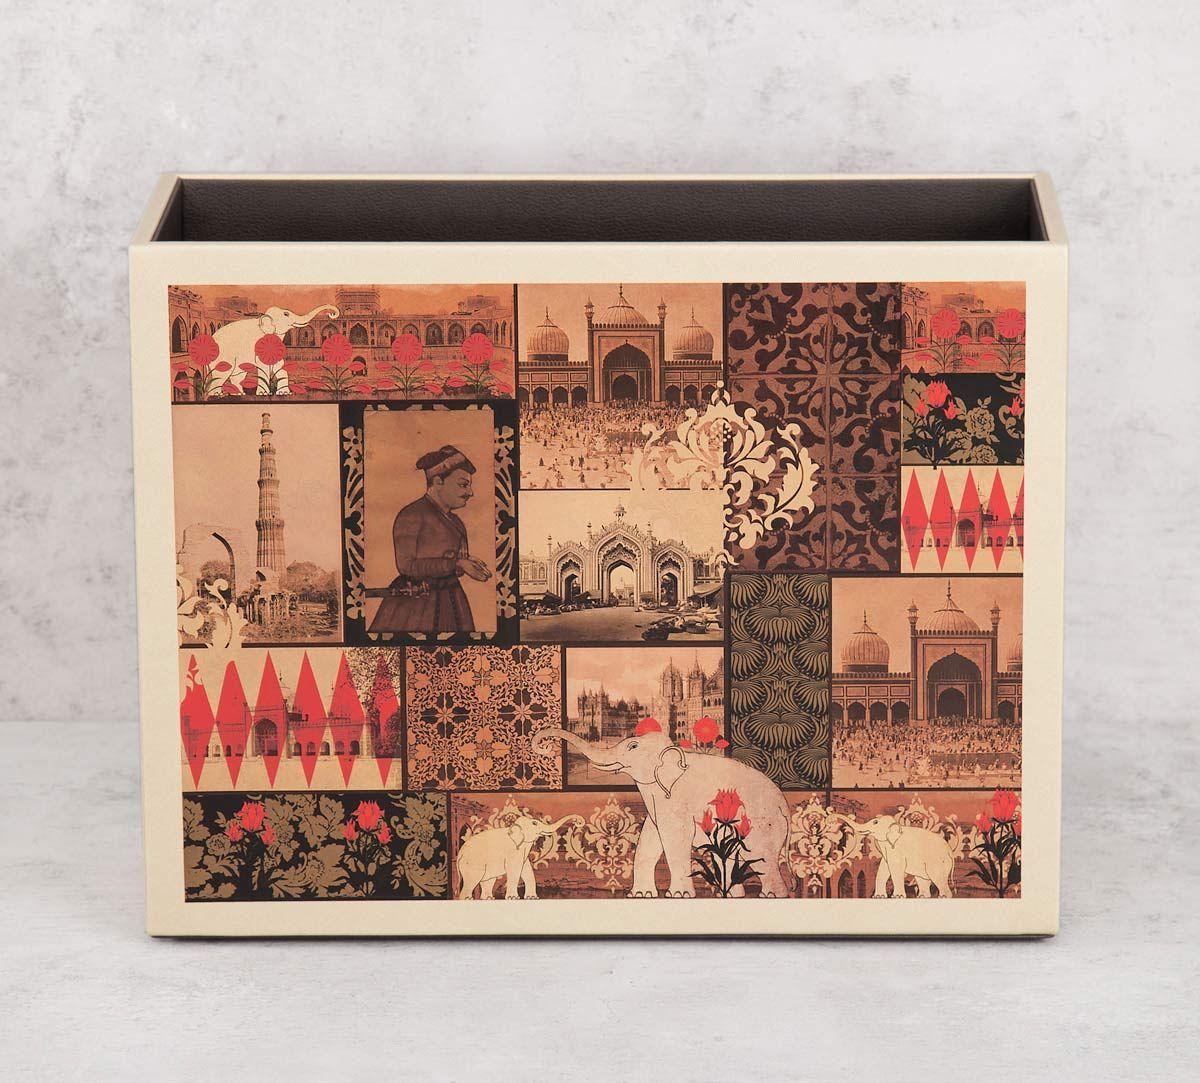 India Circus by Krsnaa Mehta The Mughal Era Leather Magazine Holder